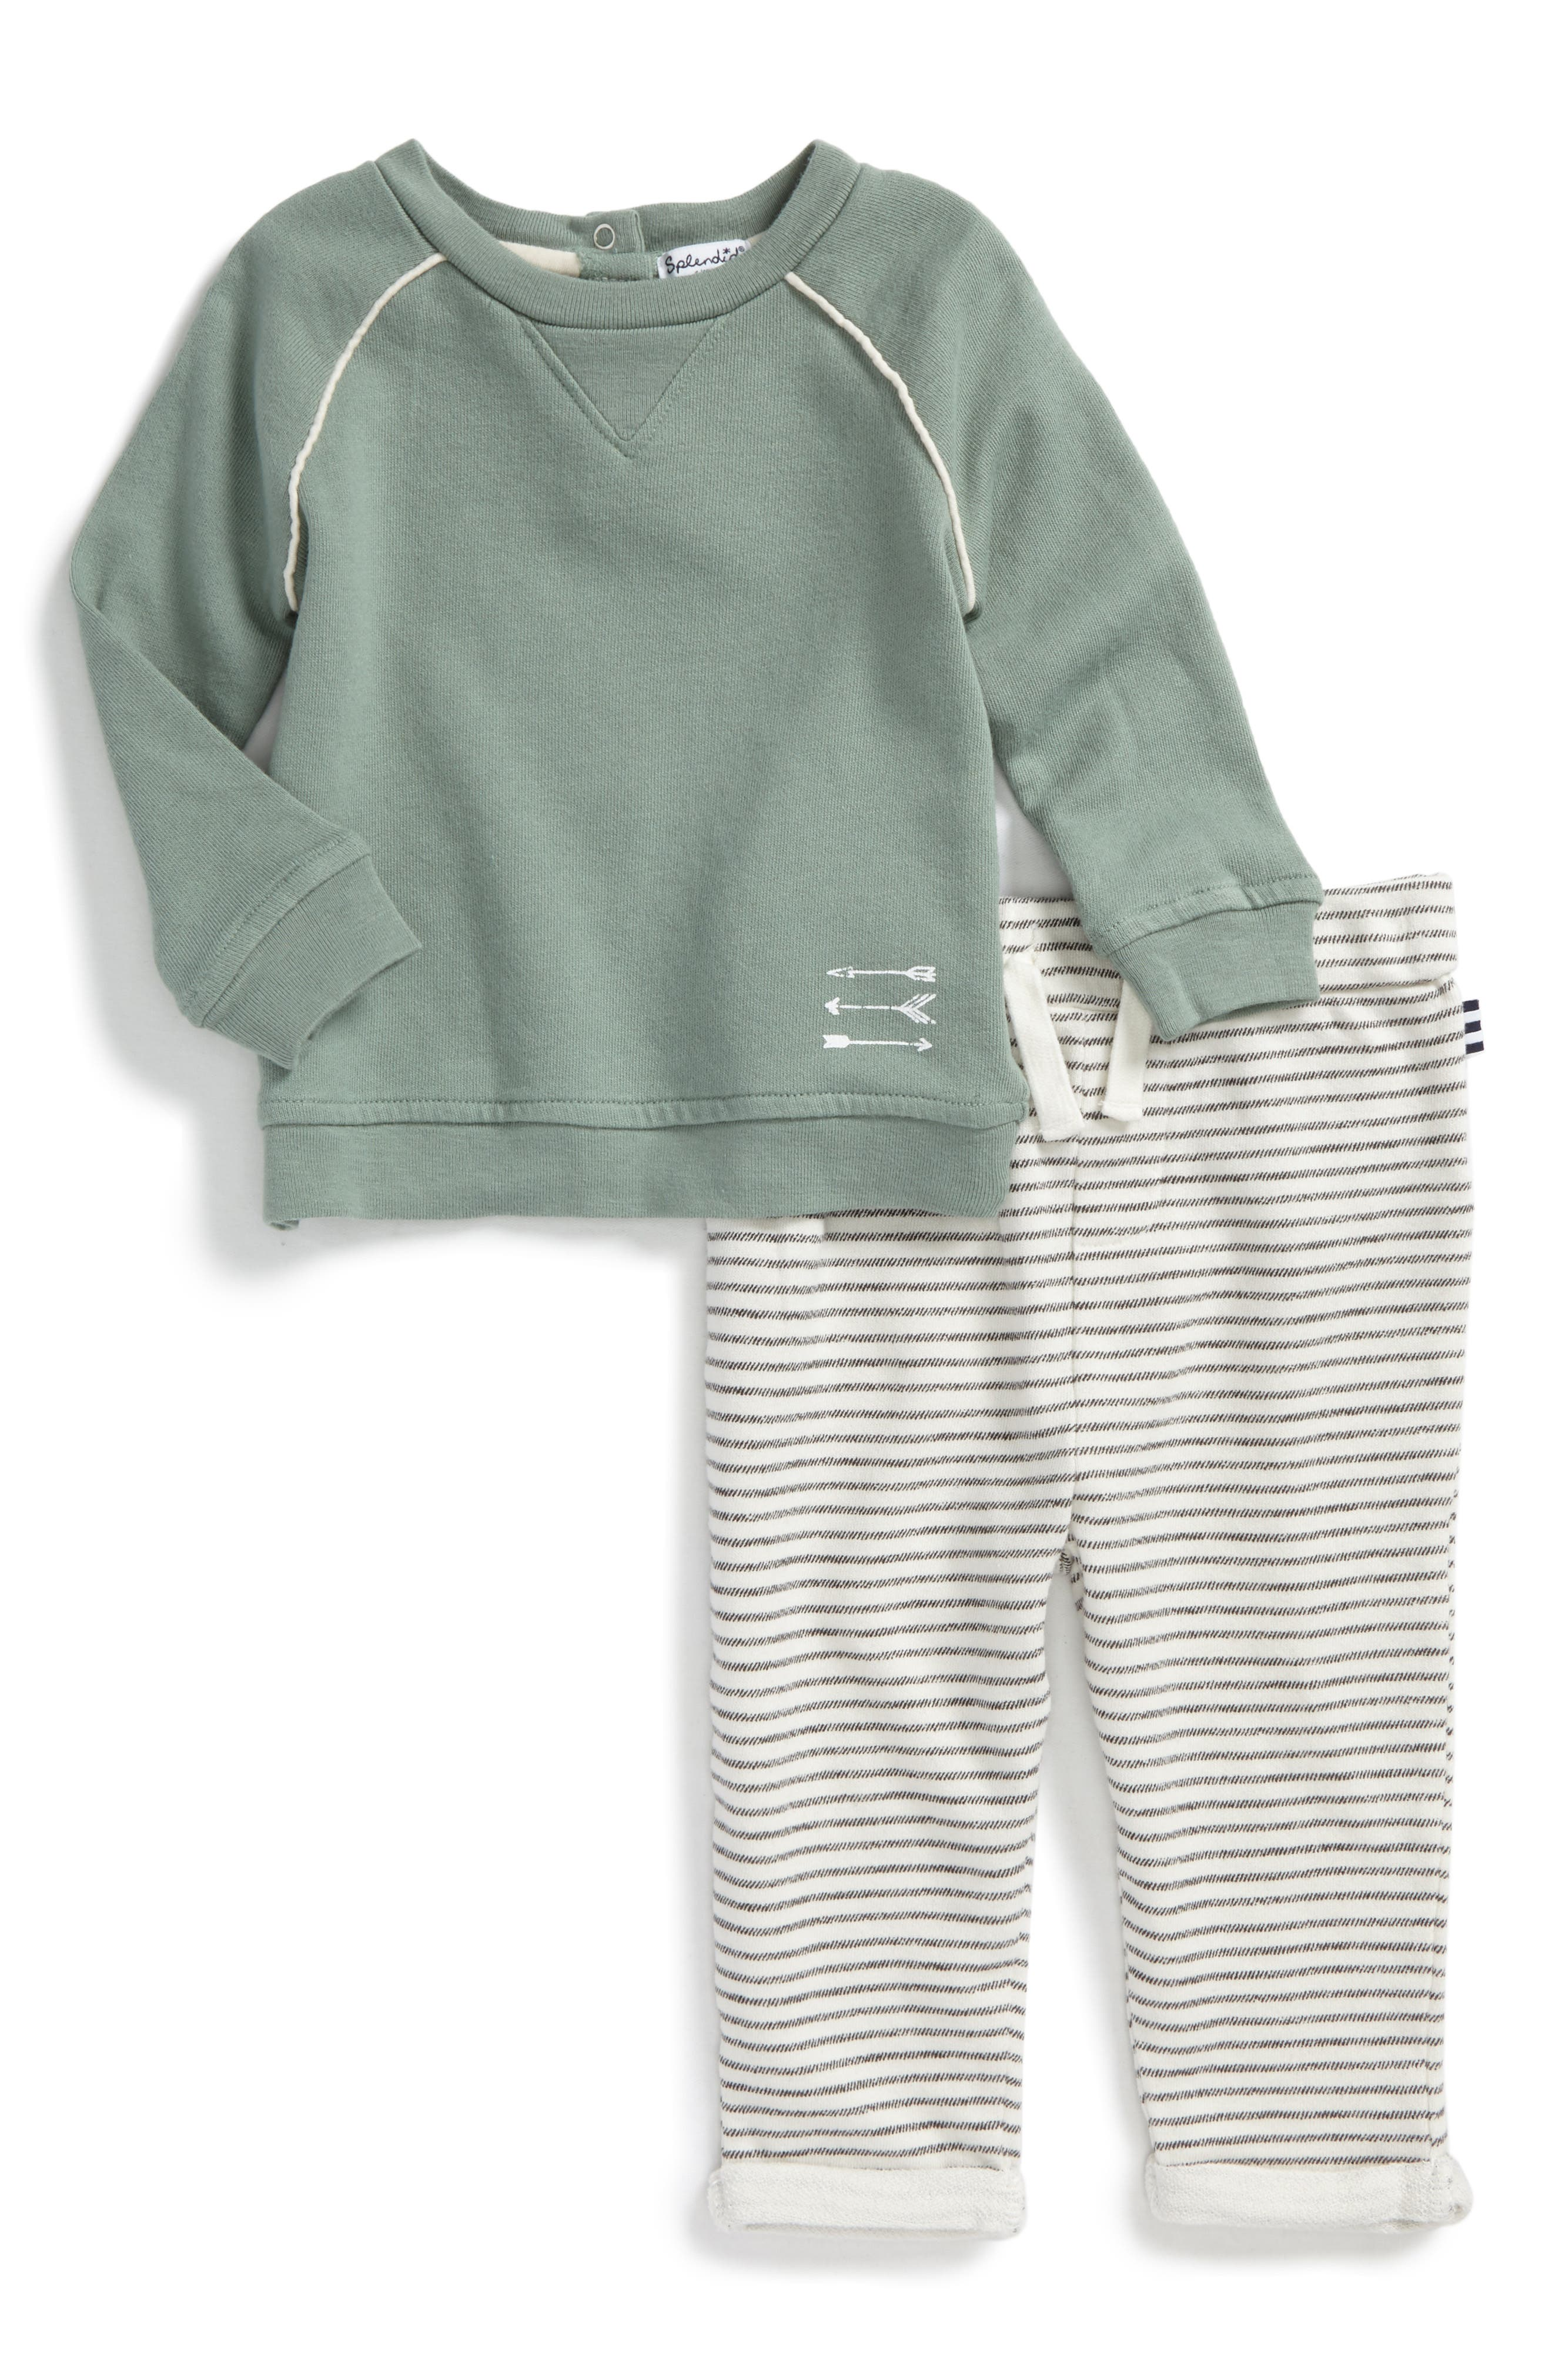 Alternate Image 1 Selected - Splendid Sweatshirt & Stripe Pants Set (Baby Boys)